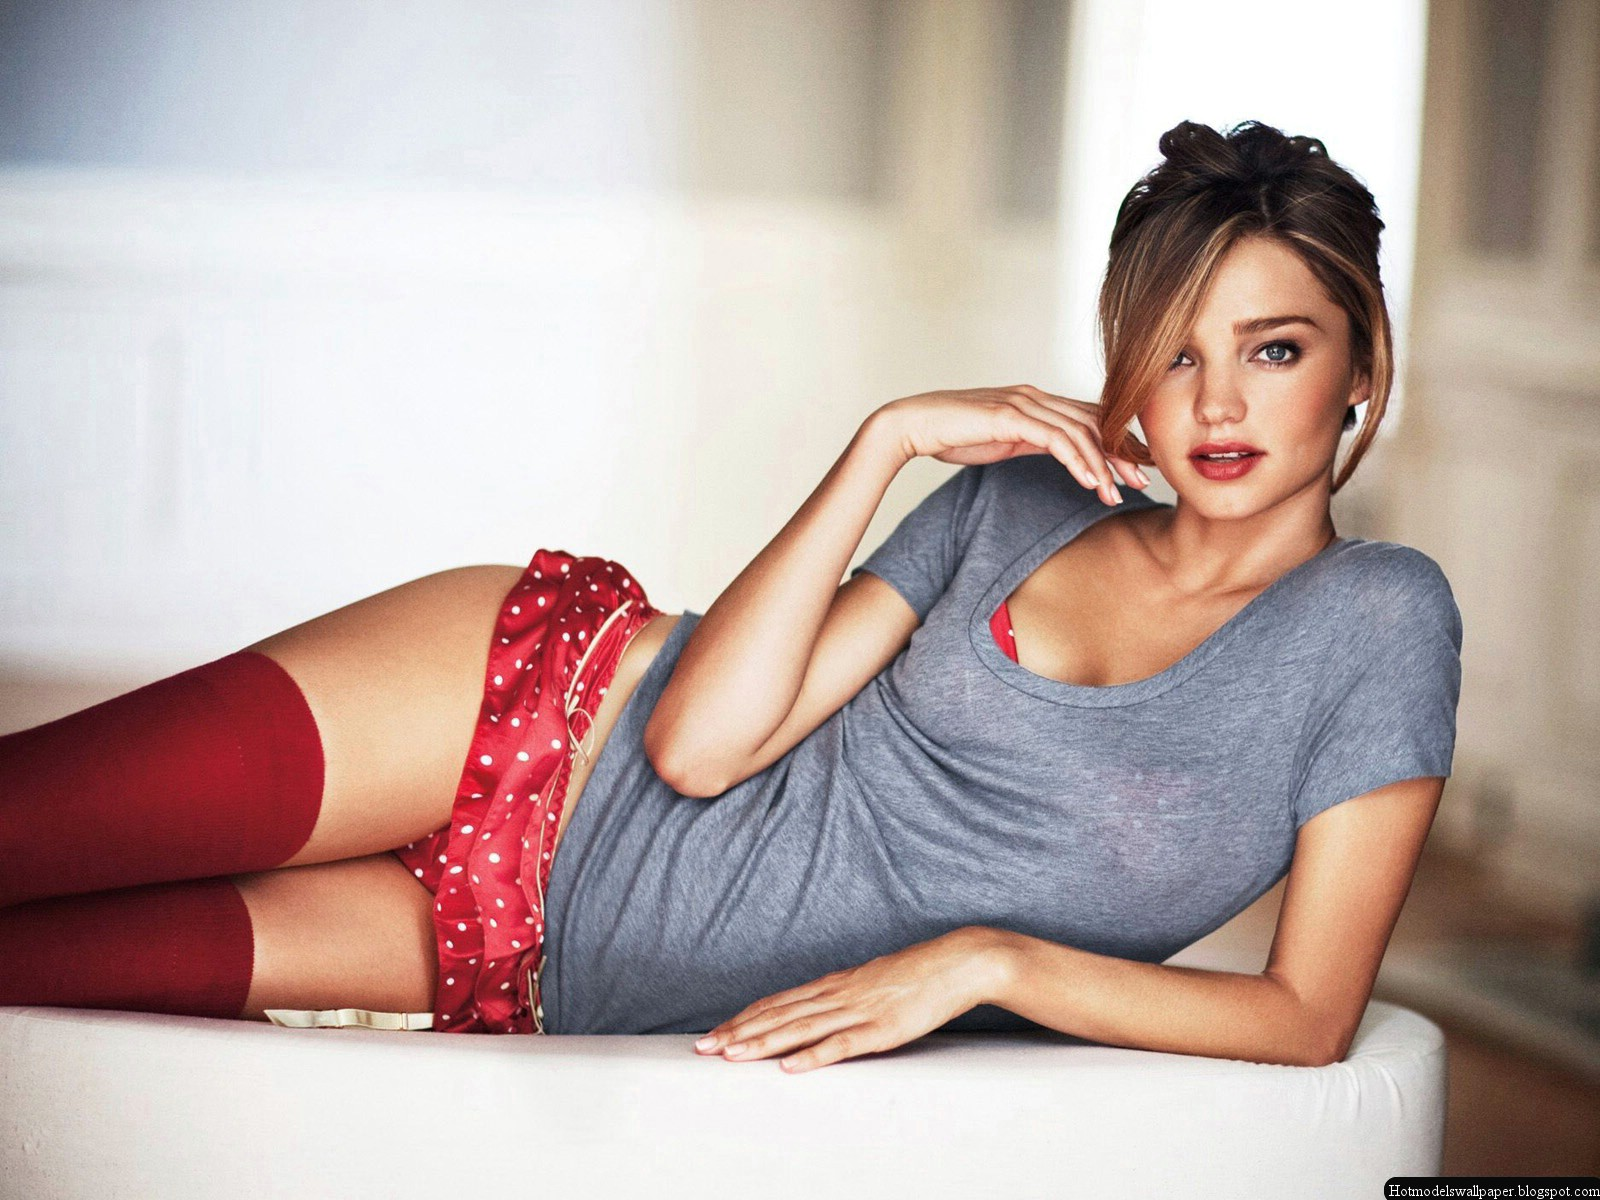 http://3.bp.blogspot.com/-E7_fcbFAW7E/UPvGFaZyzdI/AAAAAAAAAP4/o7DawNhivqg/s1600/Miranda+kerr+Hot+Blue+And+Red+Bikini.jpg